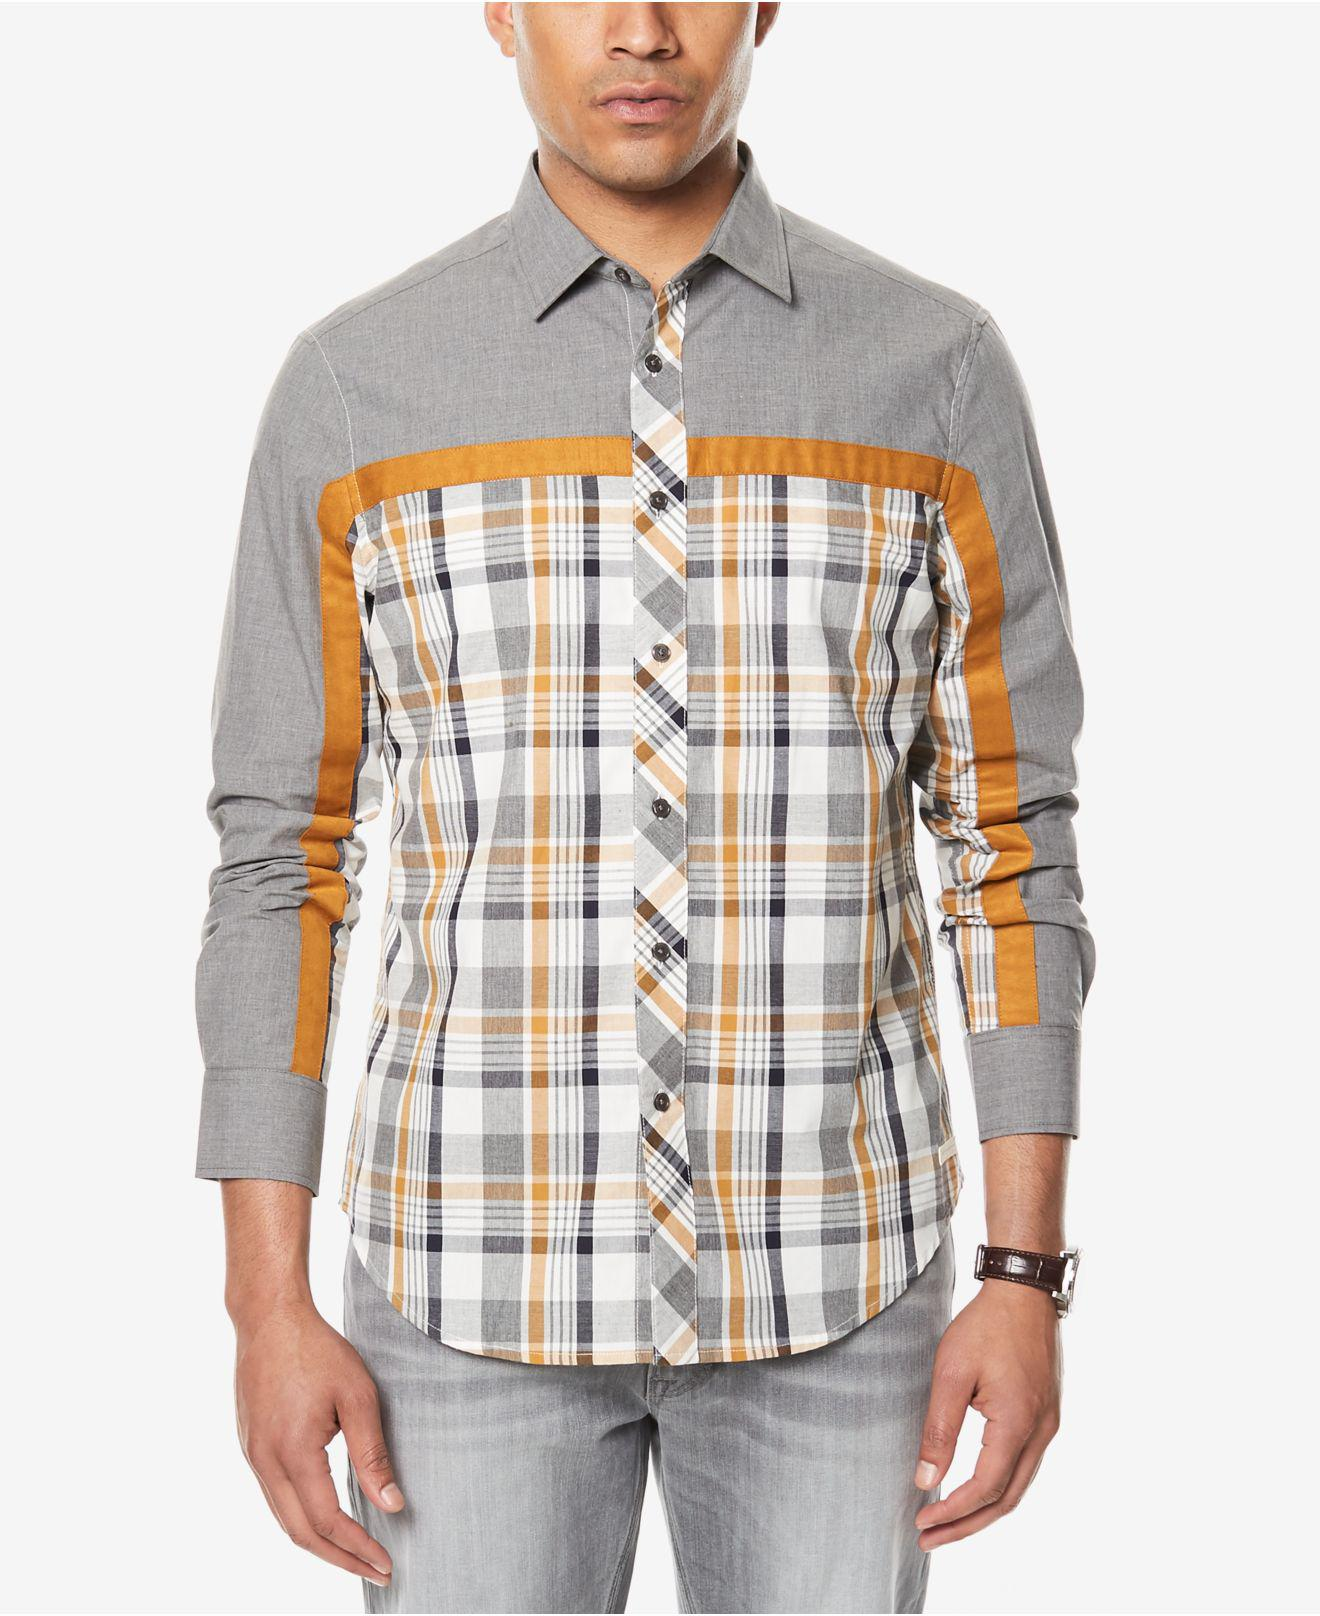 a5774ccc Lyst - Sean John Men's Melange Colorblocked Shirt in Gray for Men